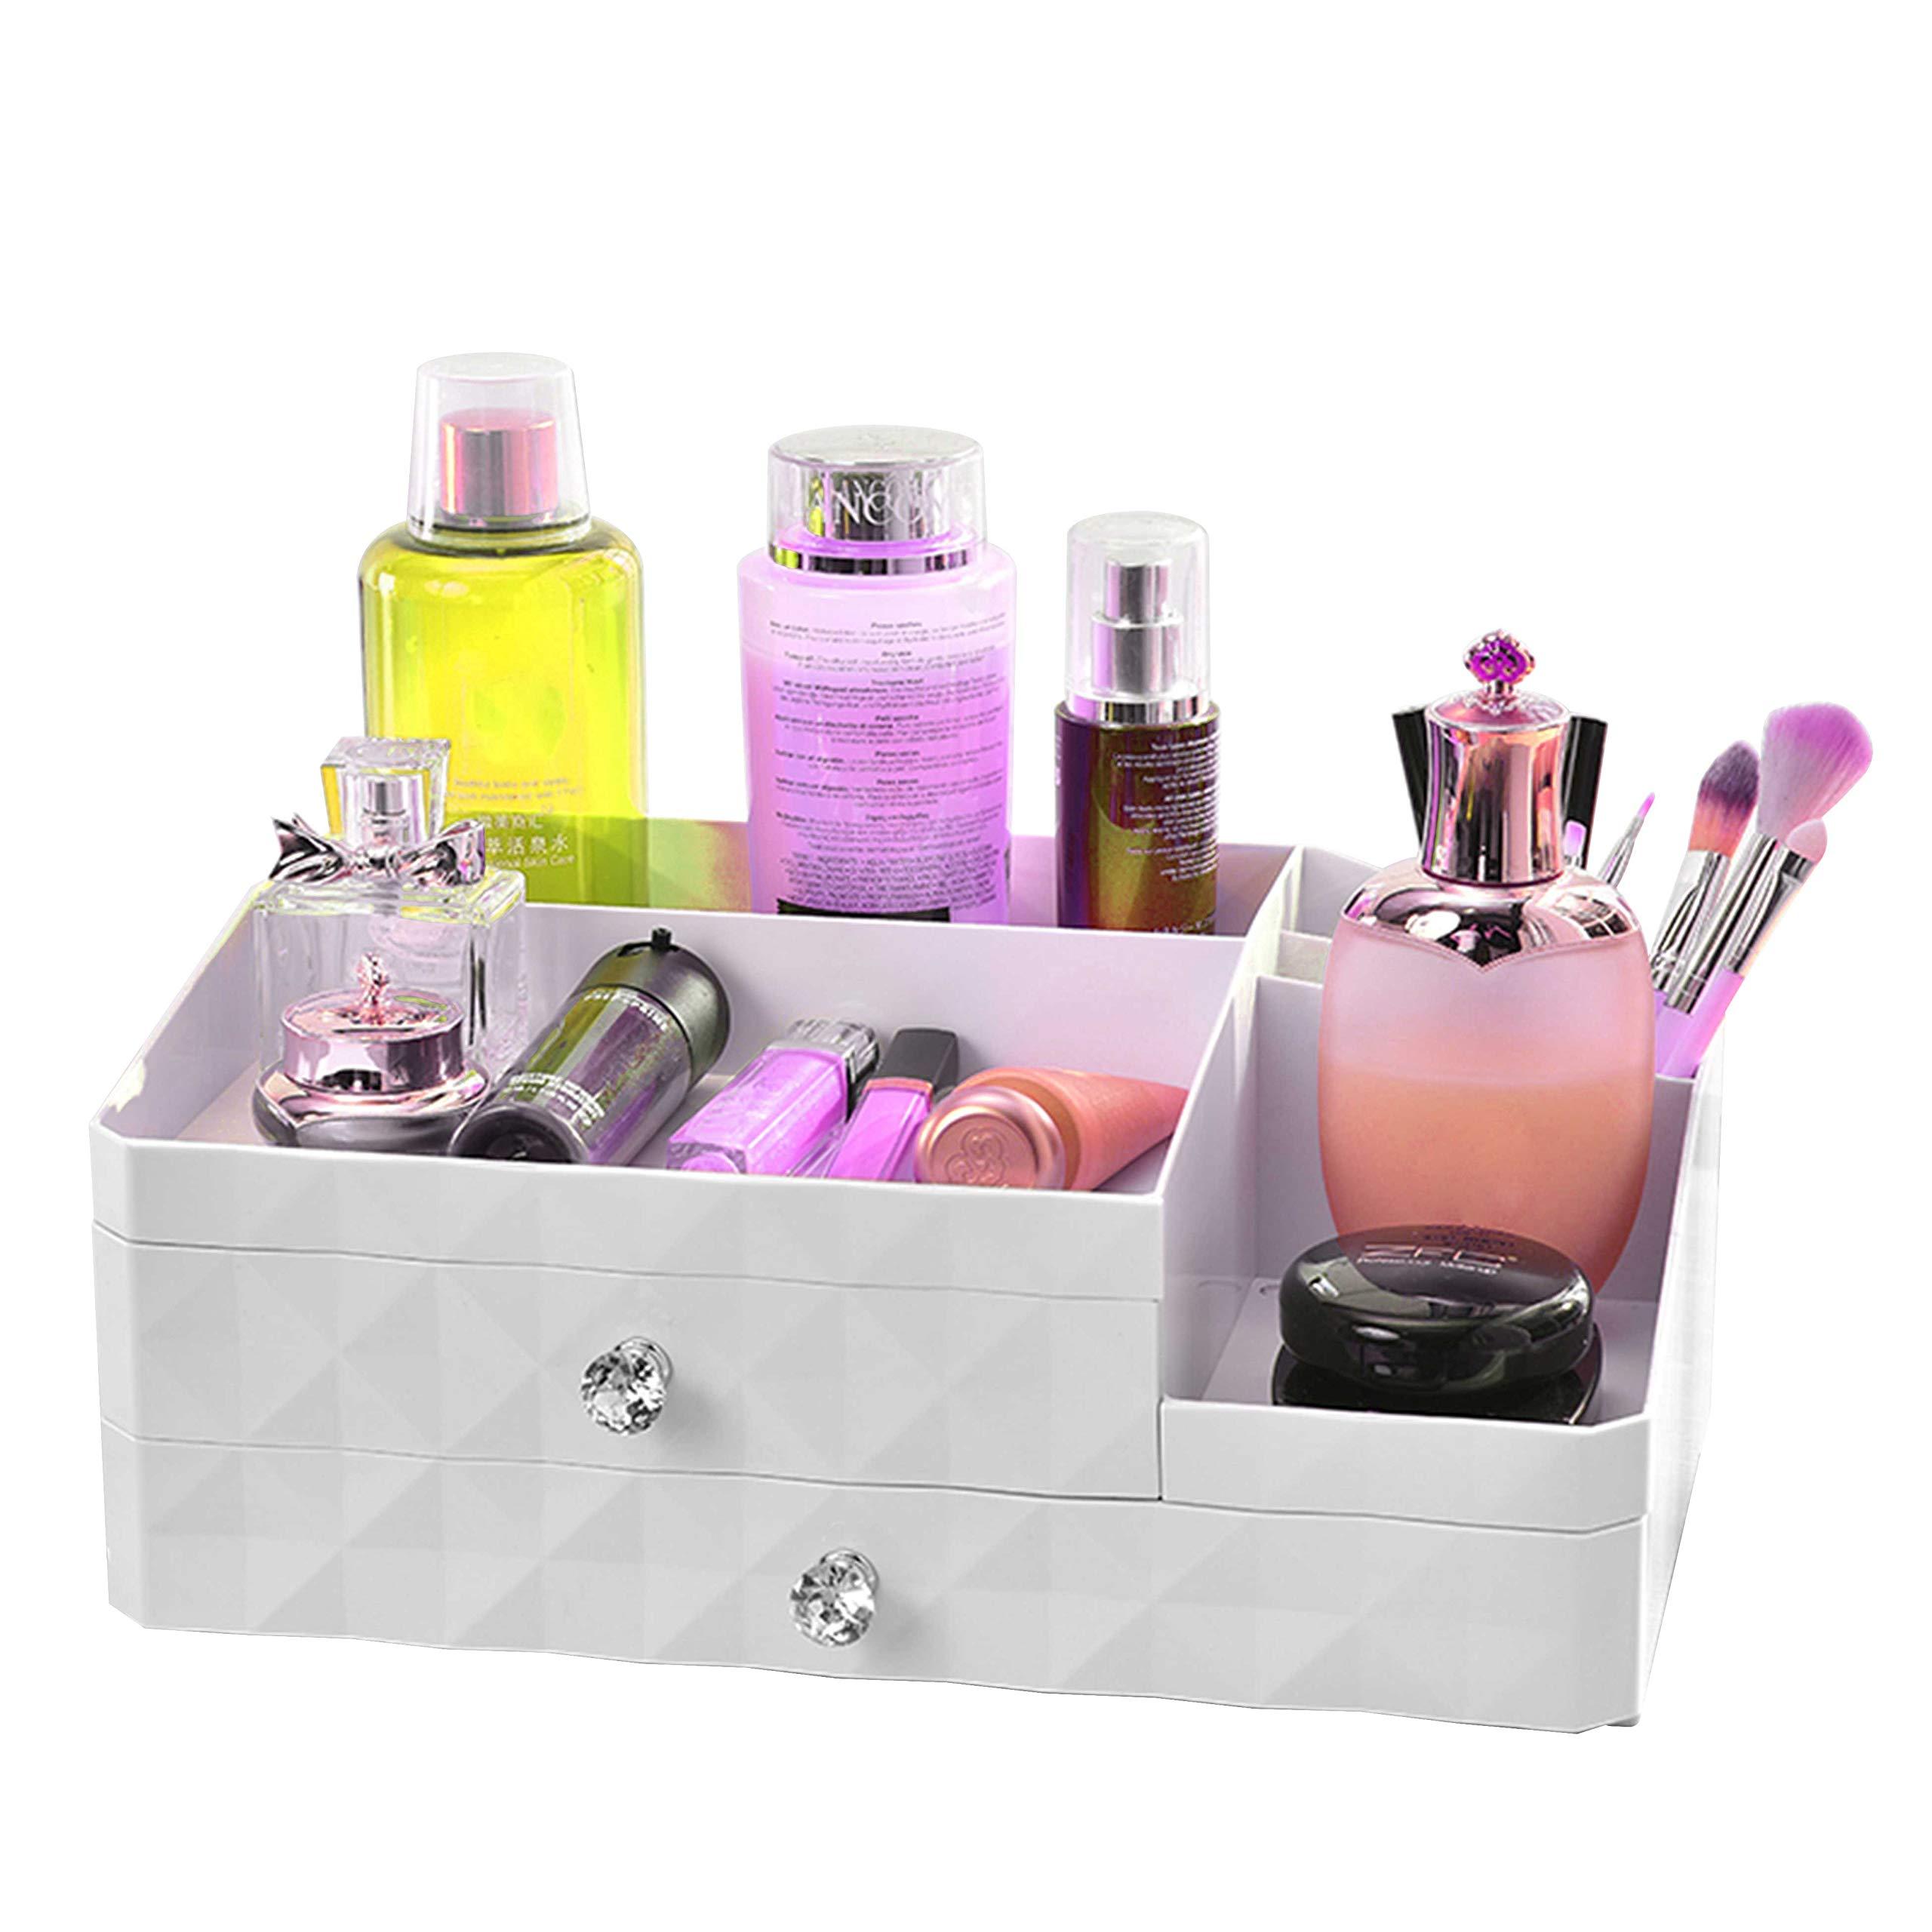 WEBI Jewelry & Makeup Drawer Organizer: Large Capacity, 3 Layers, Countertop Cosmetic Display Case, Jewelry Storage Box Holder, Vanity Bathroom Beauty Organizer, White